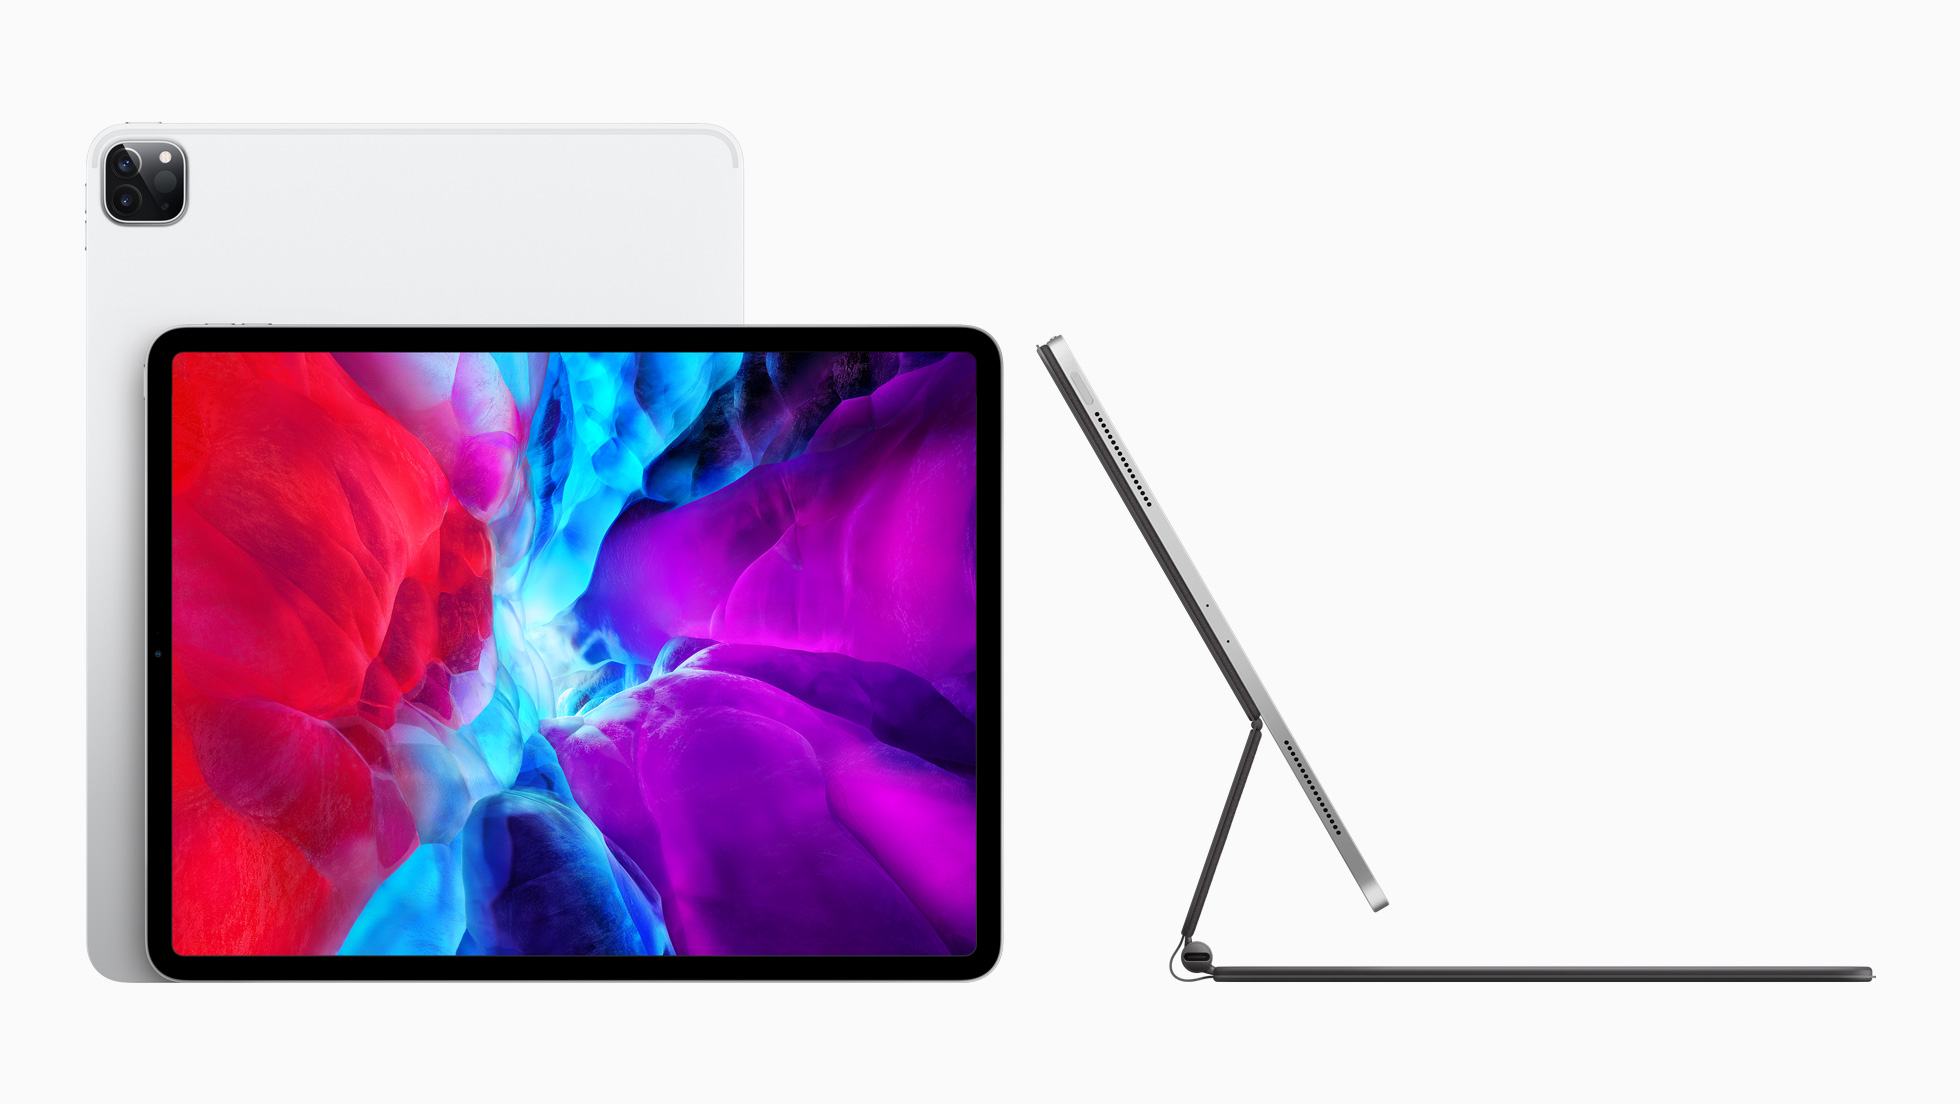 Apple iPad Pro and Magic Keyboard